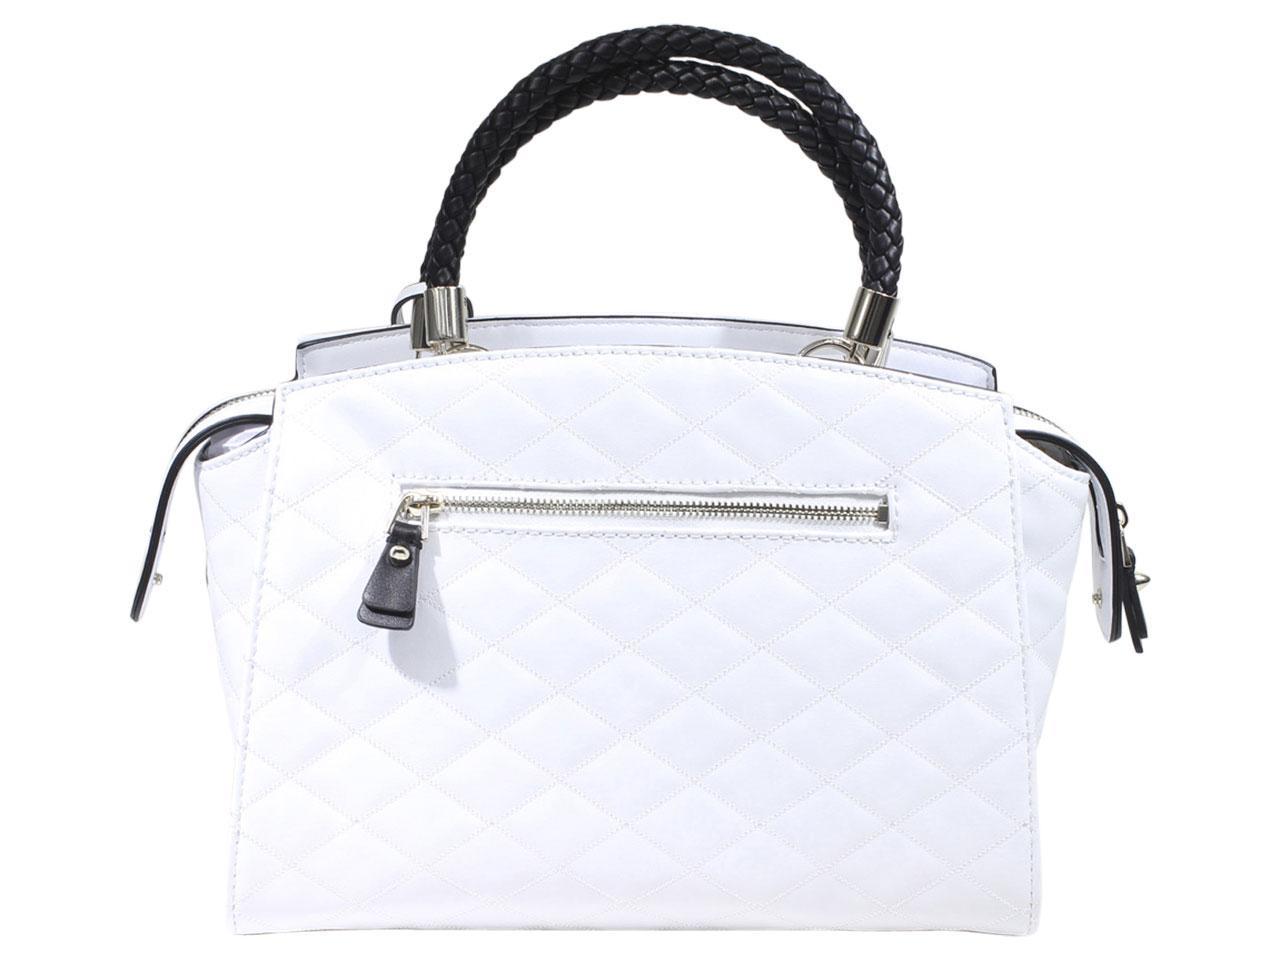 Guess-Women-039-s-Heather-Embroidered-Satchel-Handbag